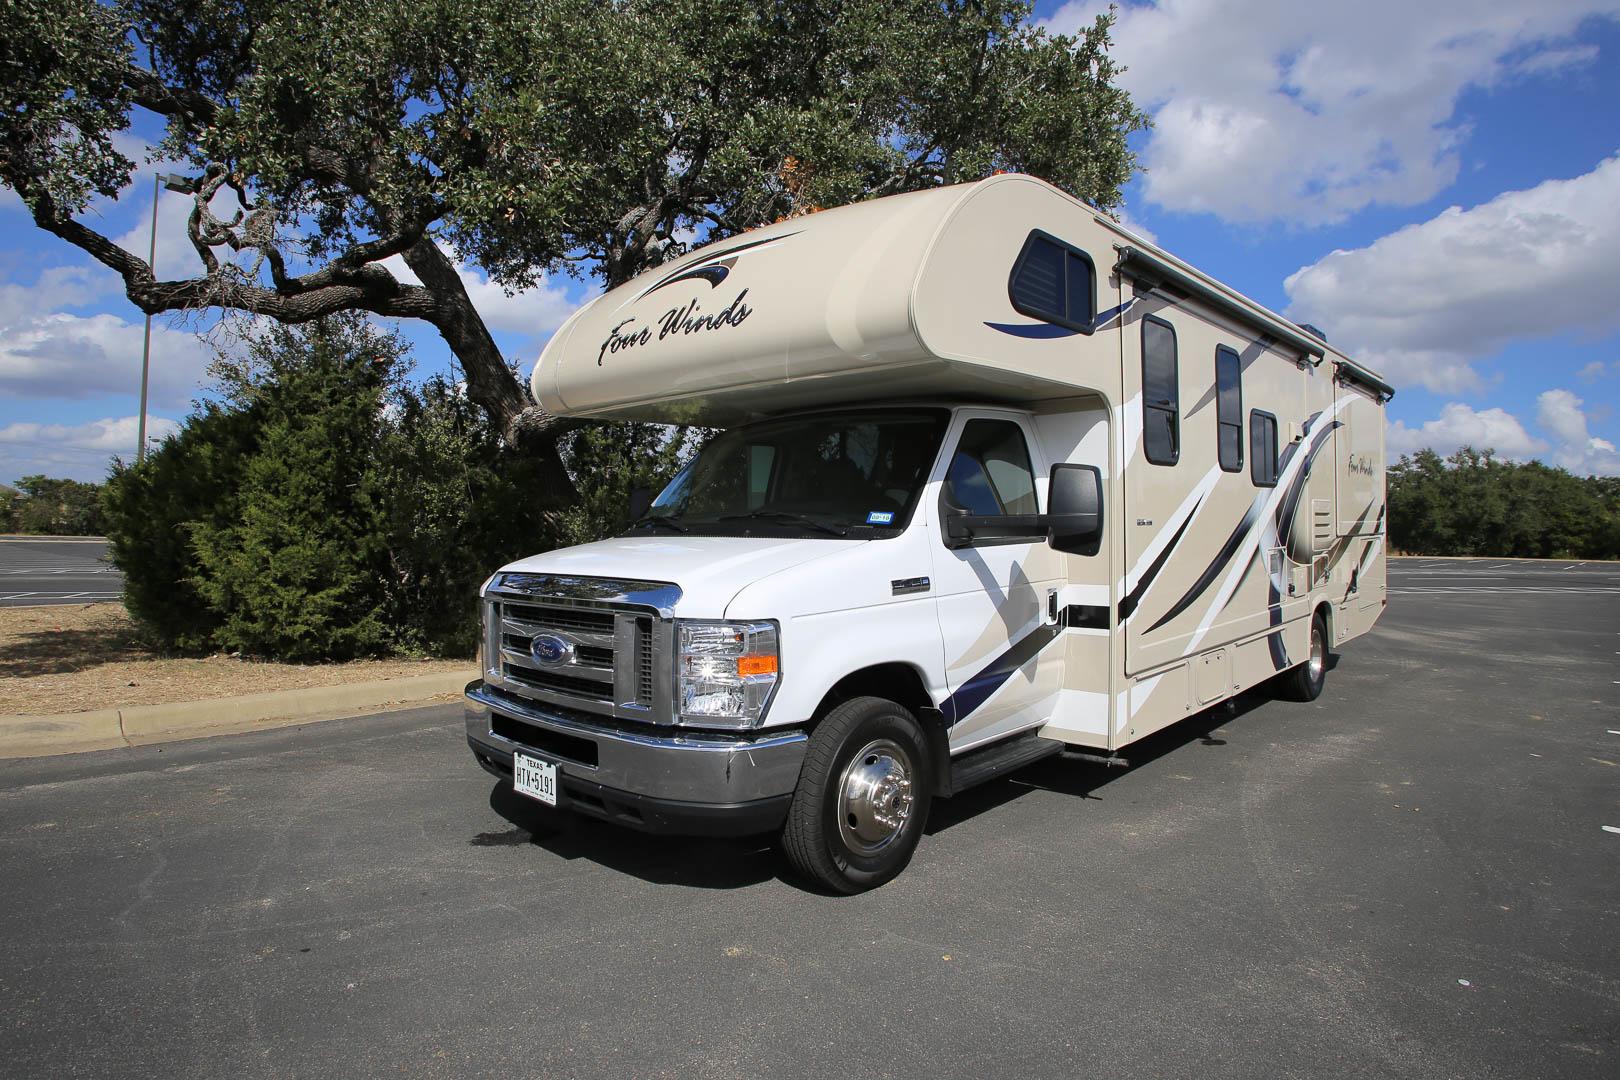 American Adventure RV Rentals image 1